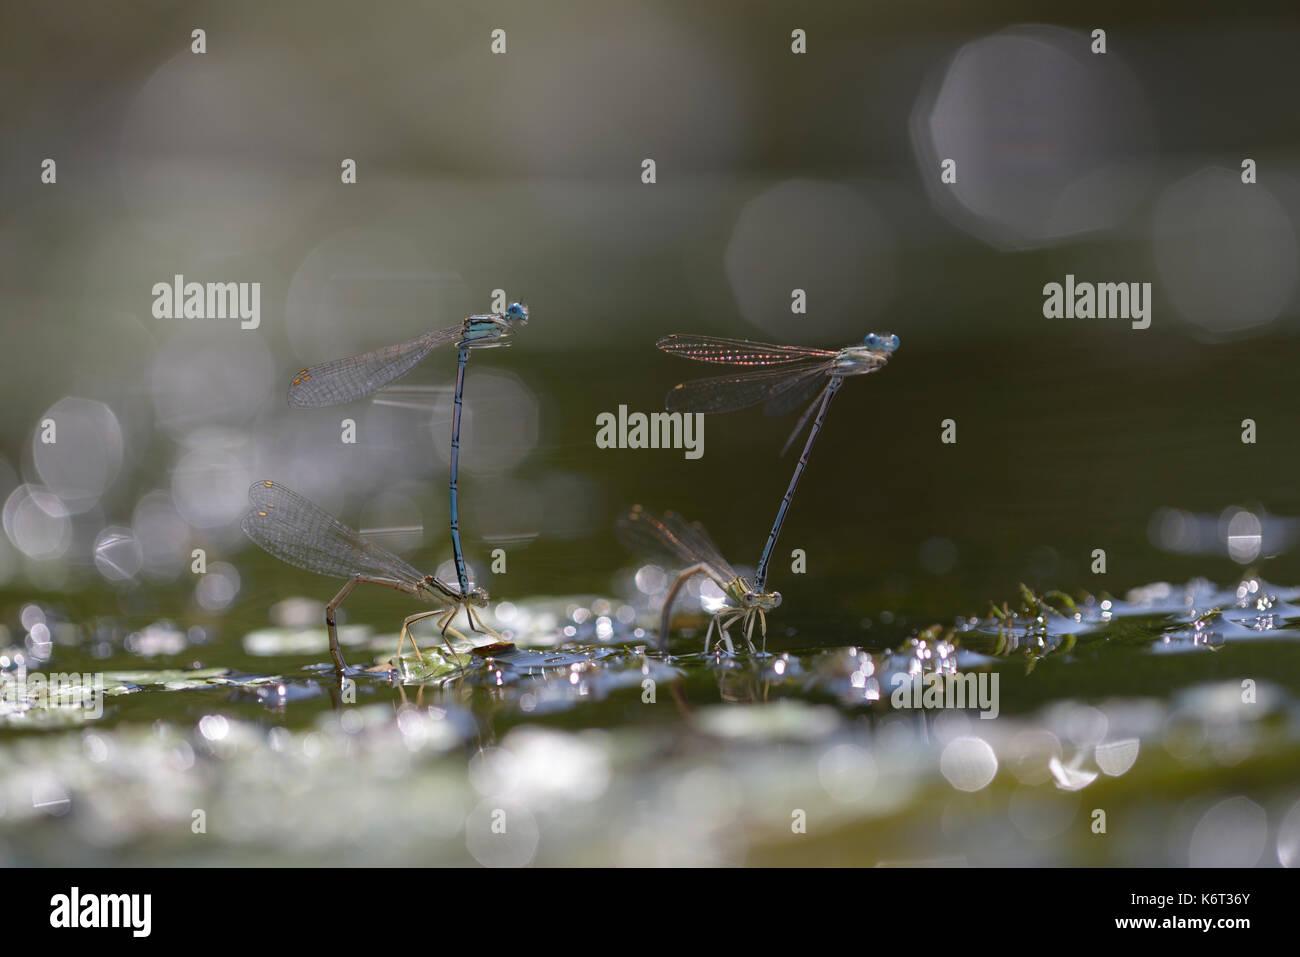 Damselflies, Lestidae, - laying eggs underwater in front of blurred background. - Stock Image